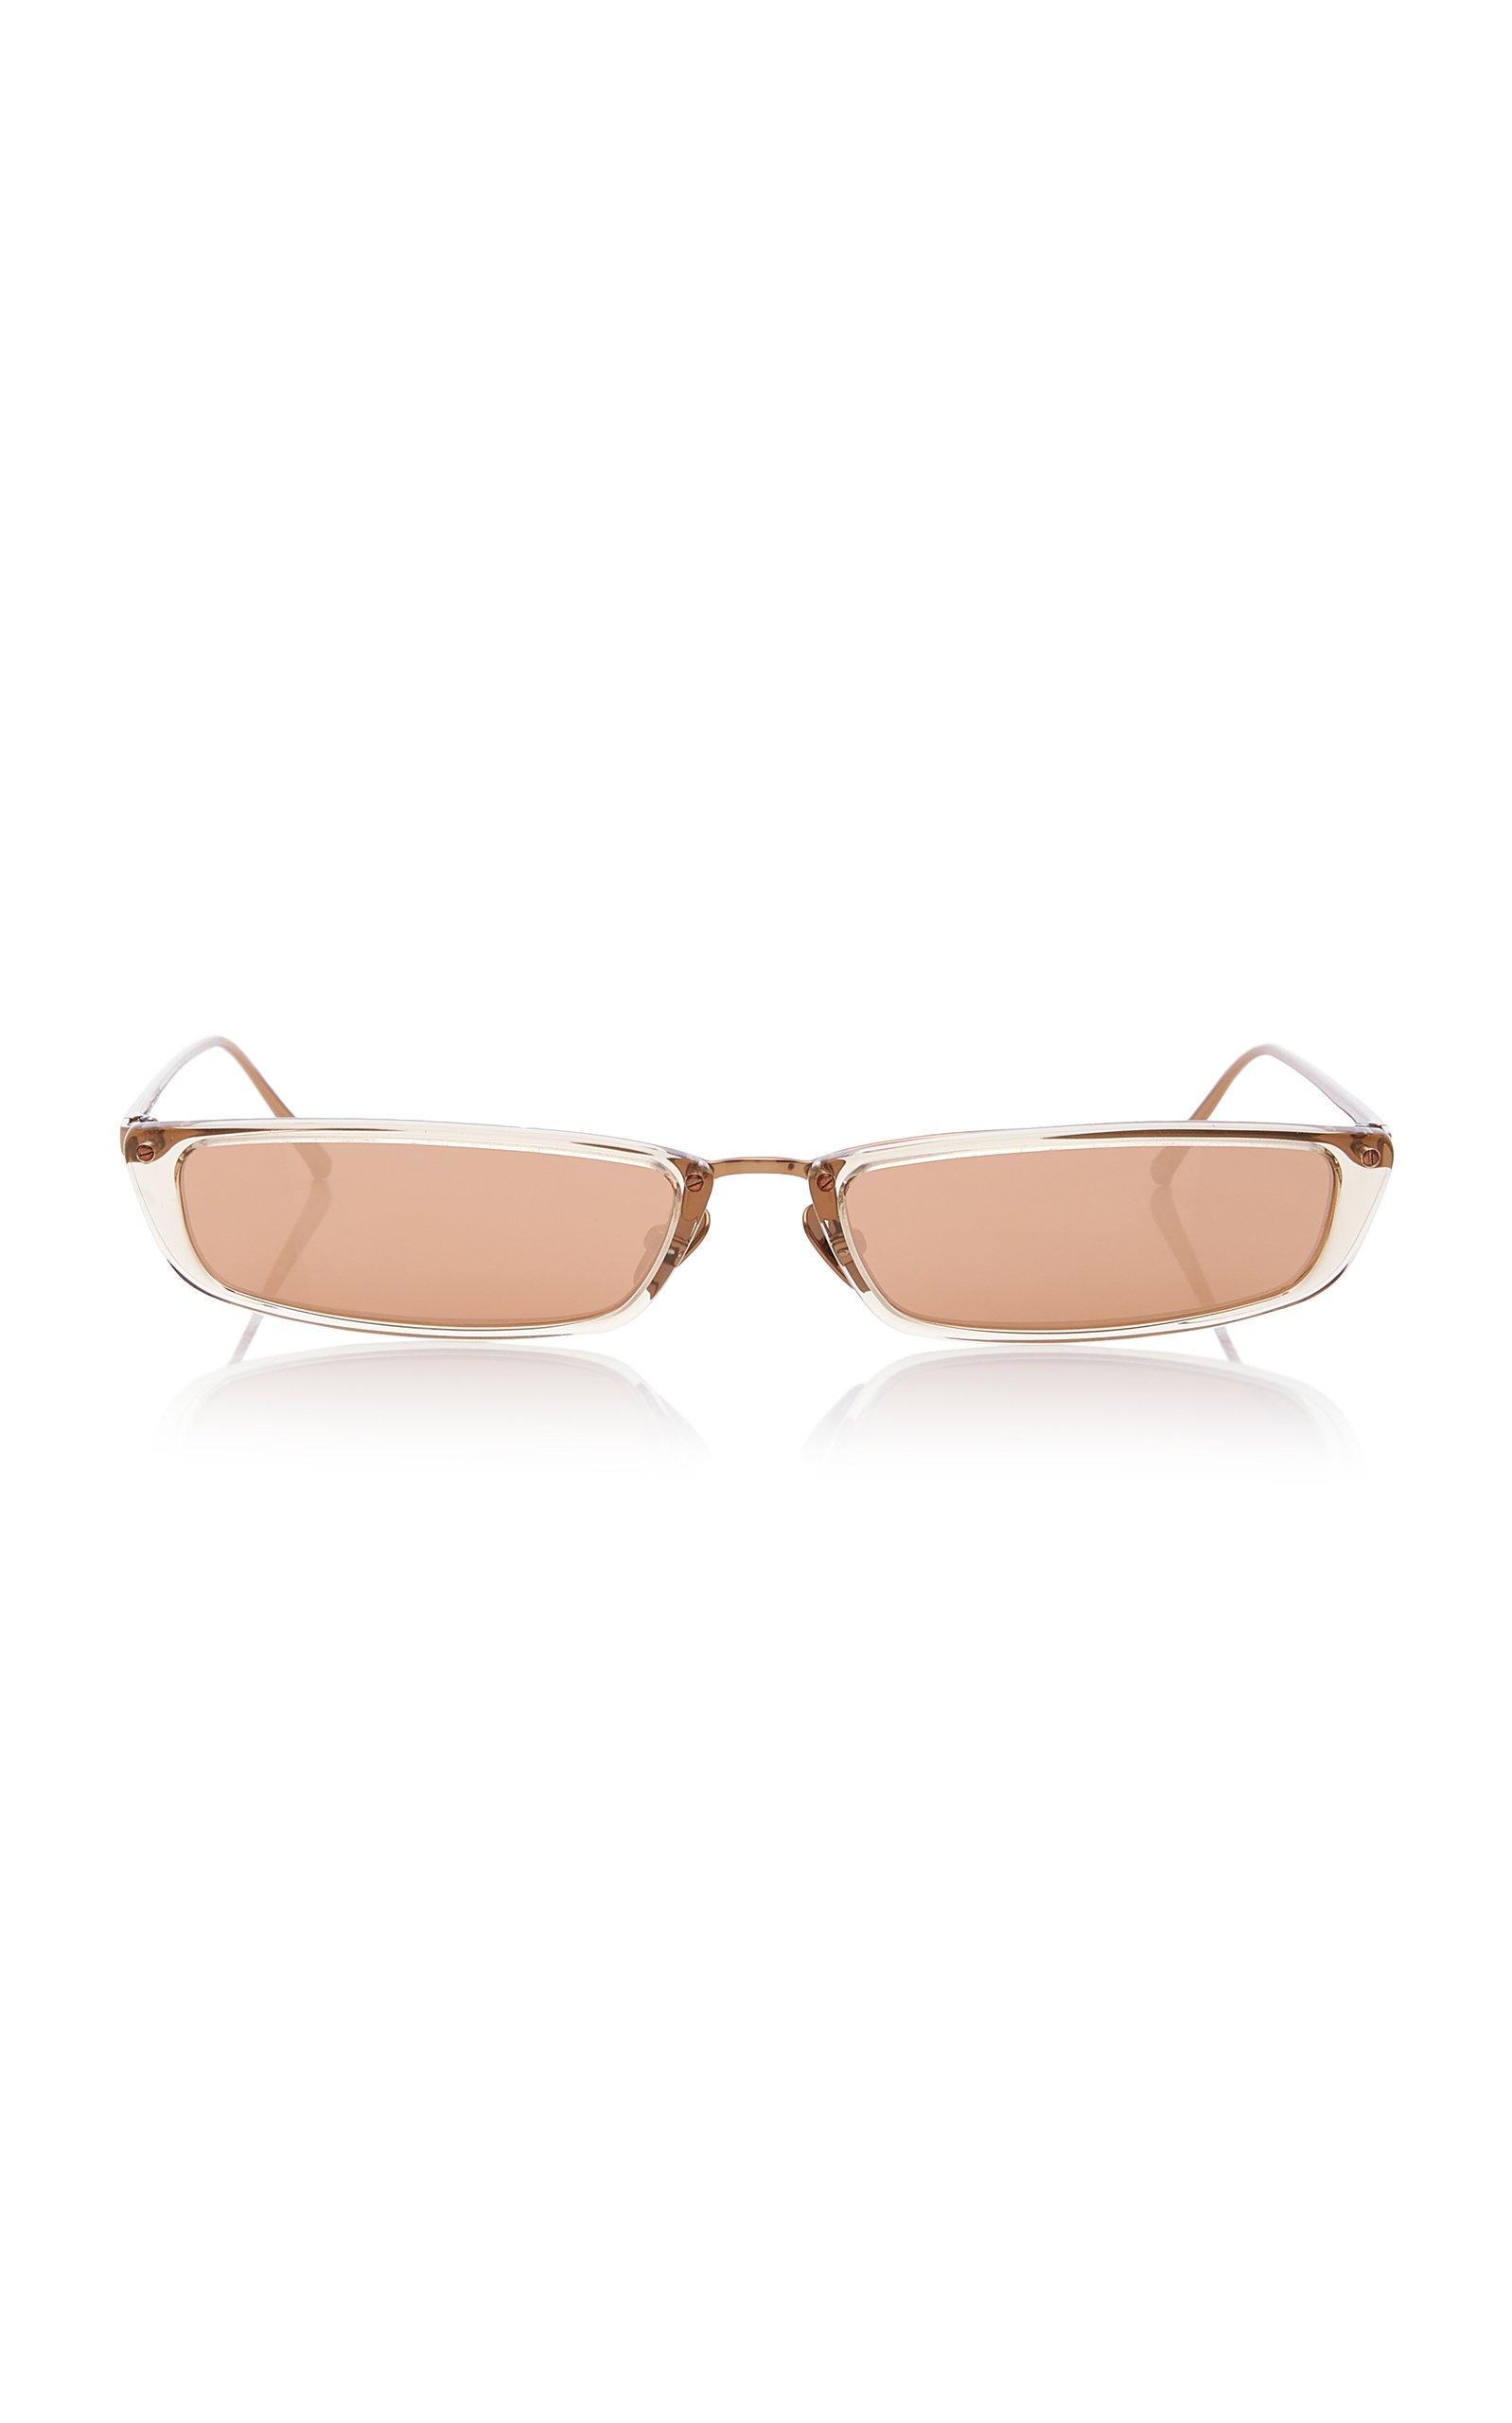 Linda Farrow Square-Frame Acetate And Metal Sunglasses